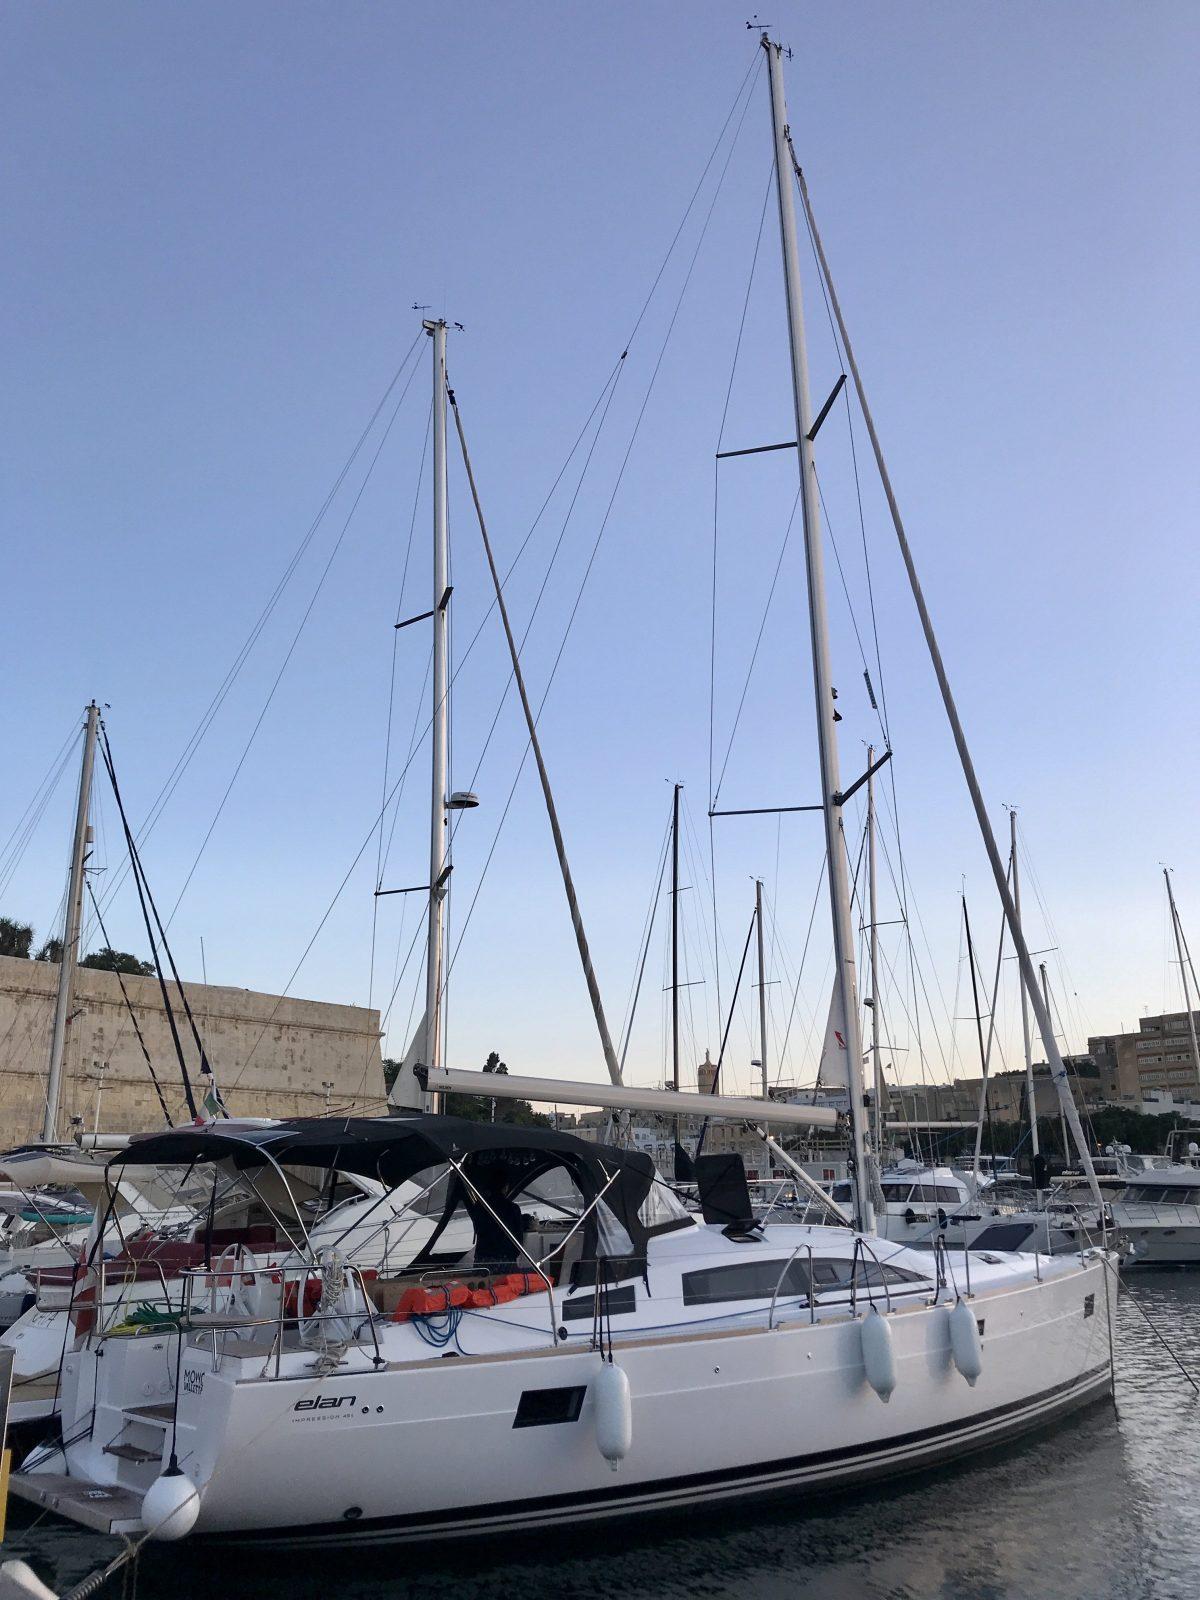 Sailing yacht in the marina